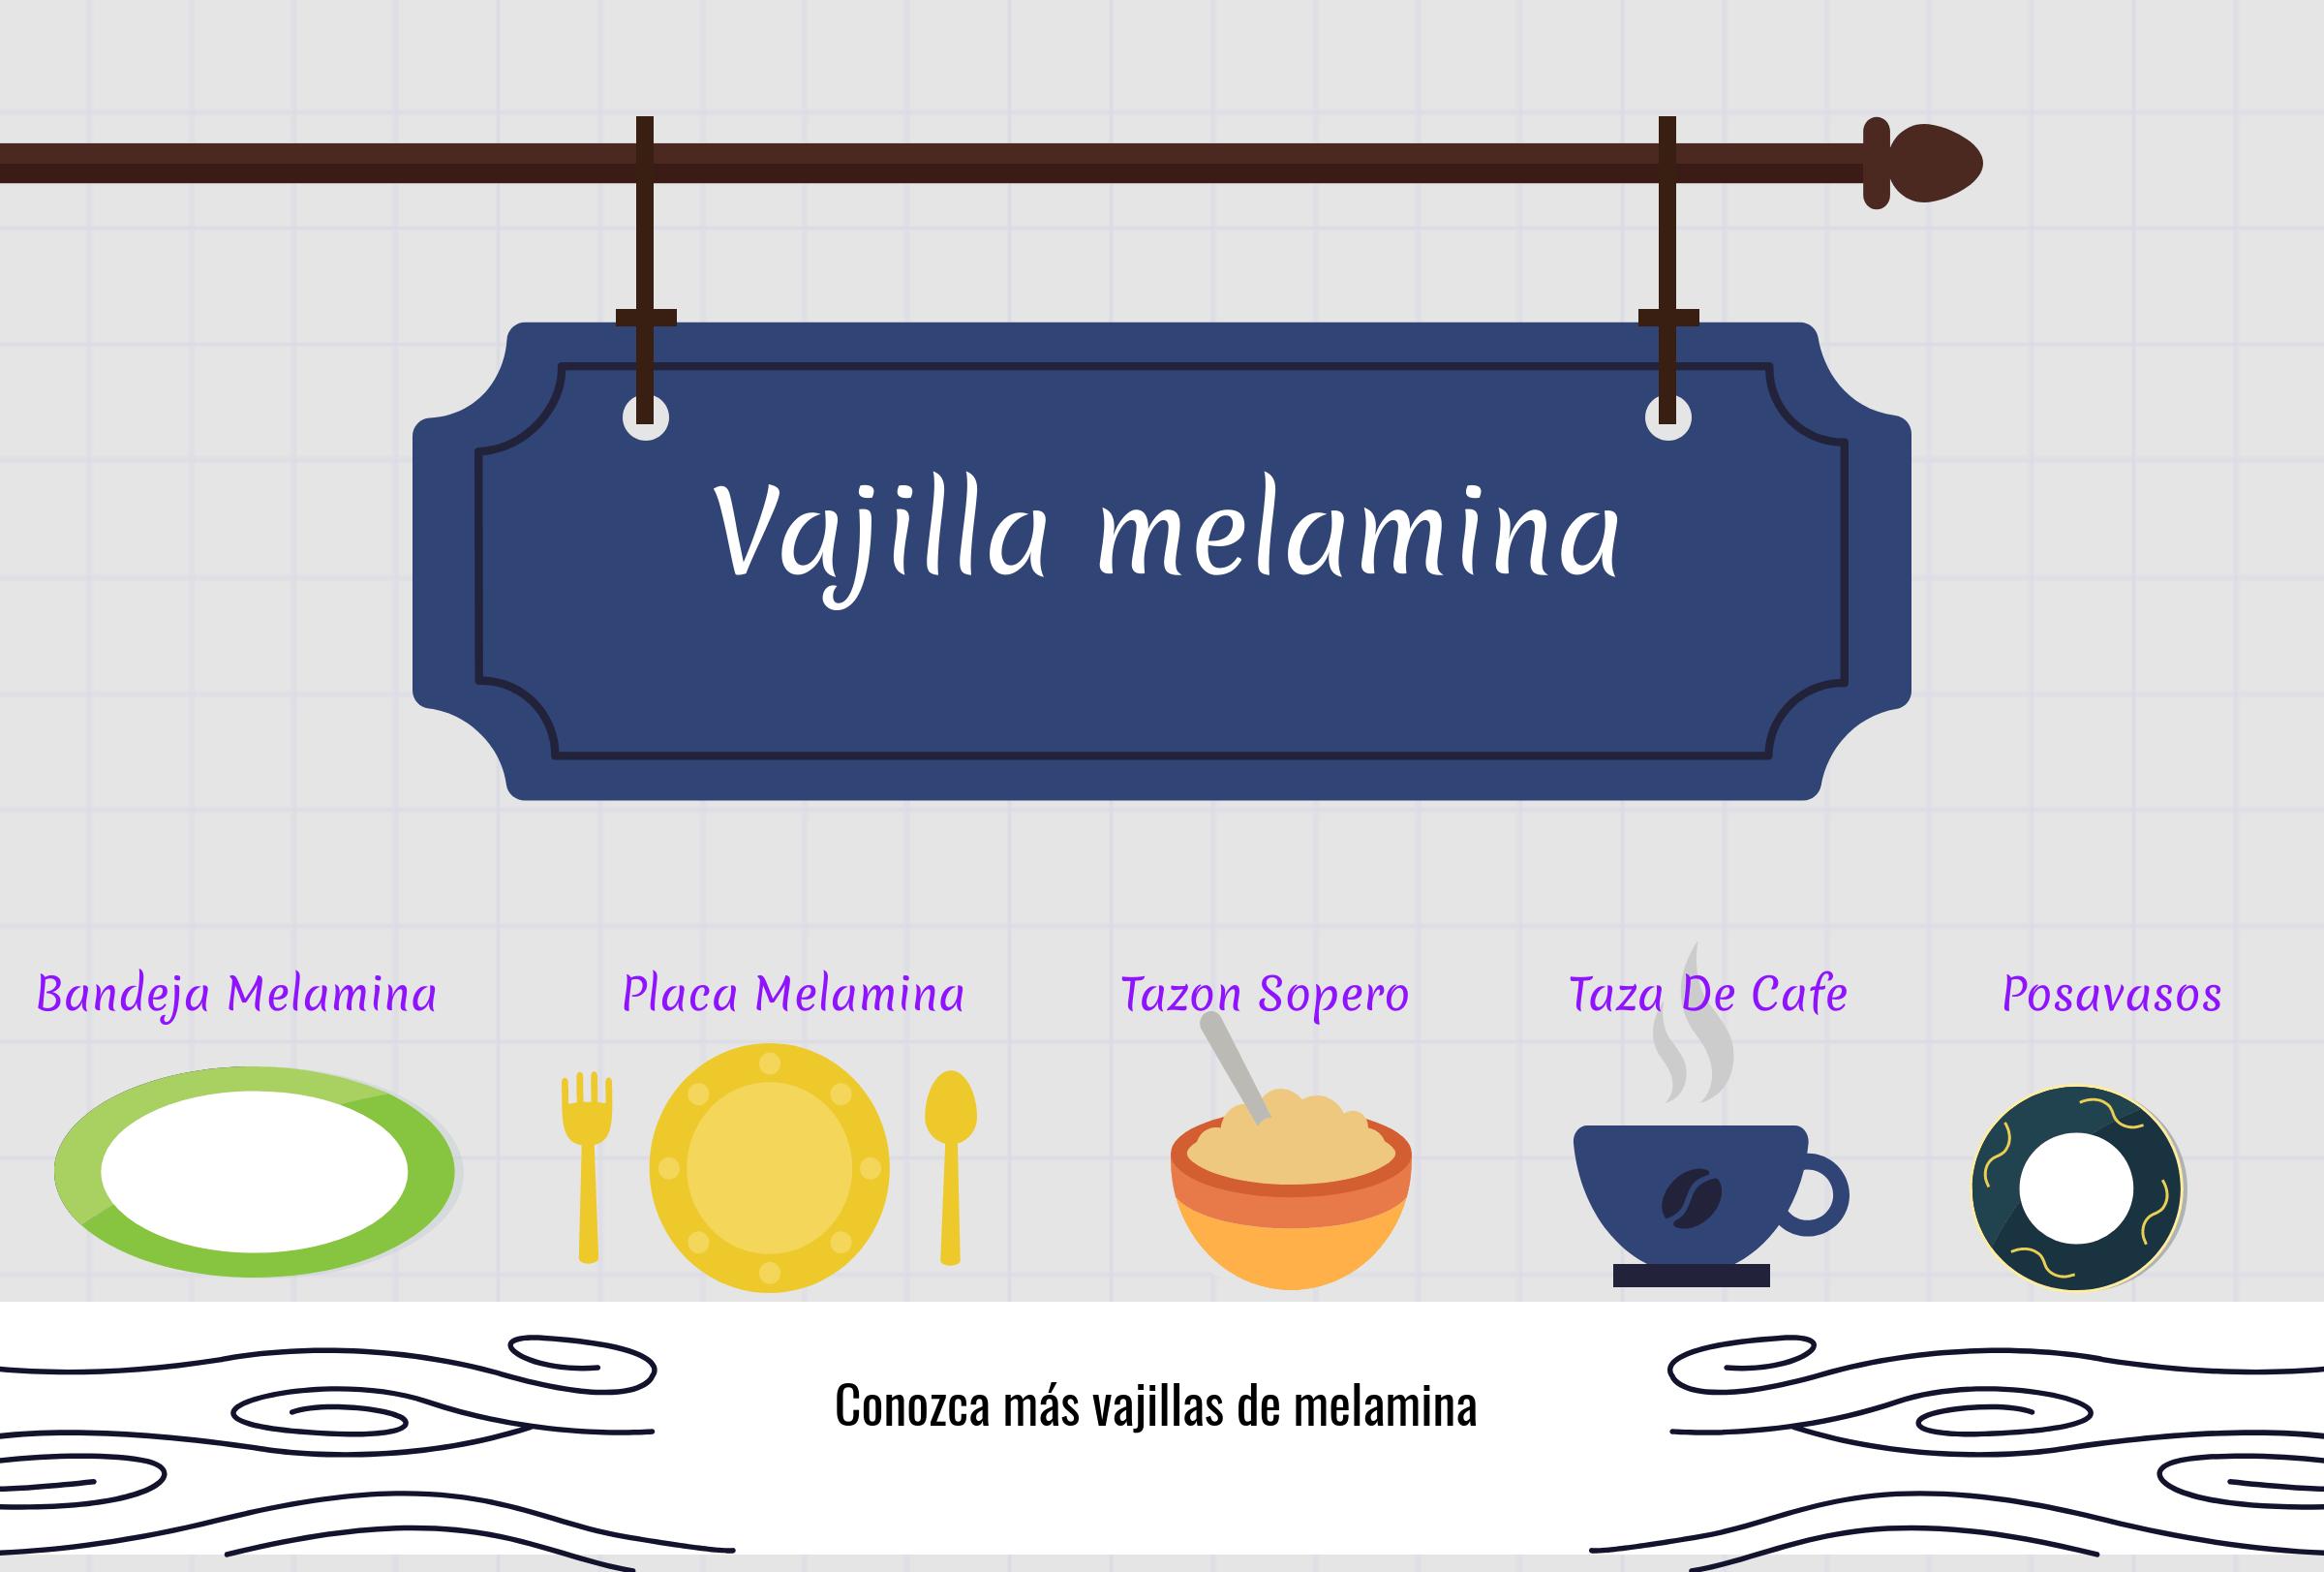 Vajilla de melamina